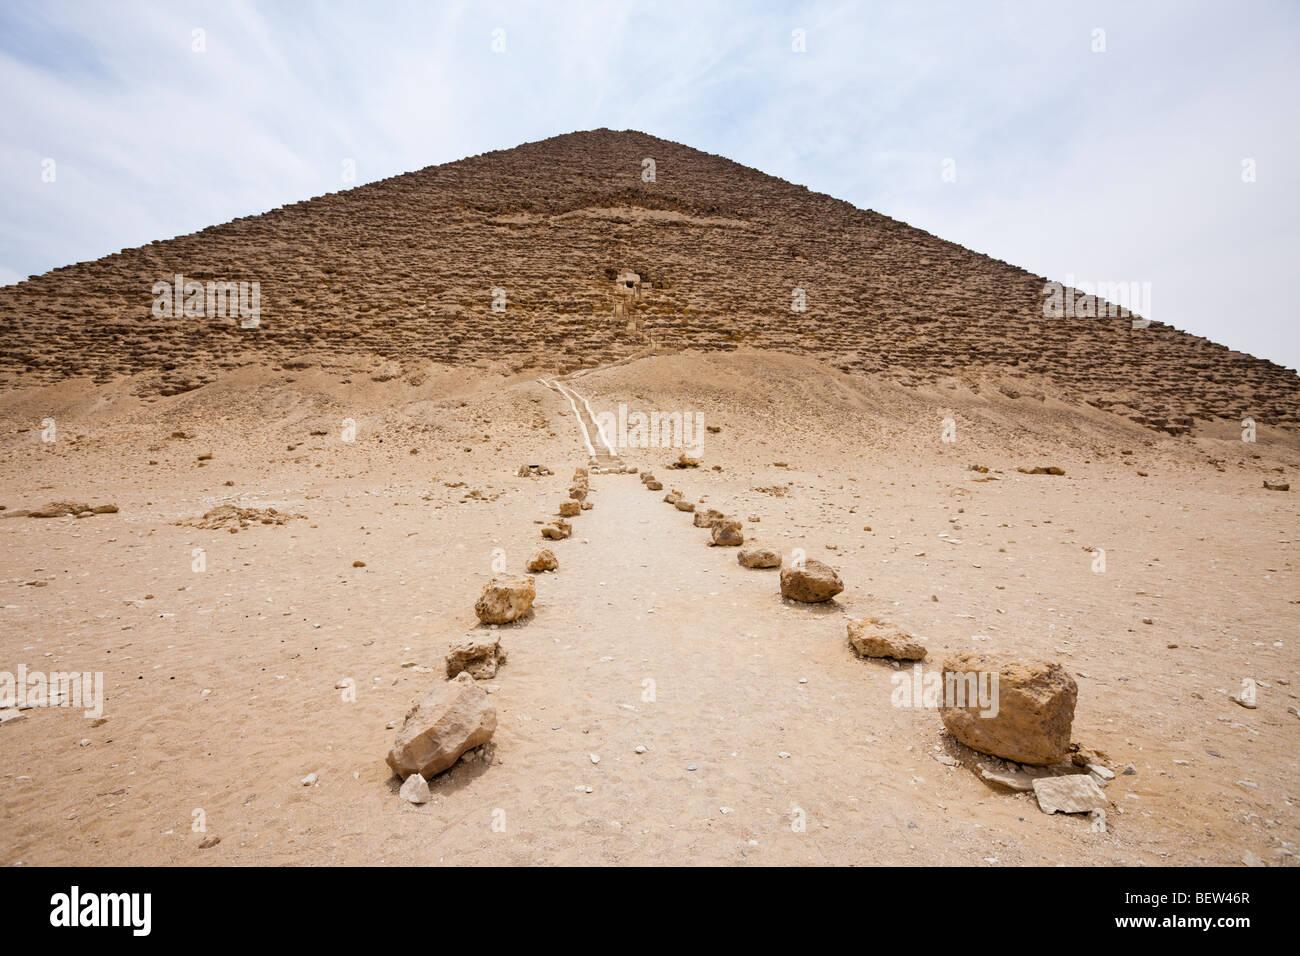 Entrance Red Pyramid of Pharaoh Snofru, Dahshur, Egypt - Stock Image